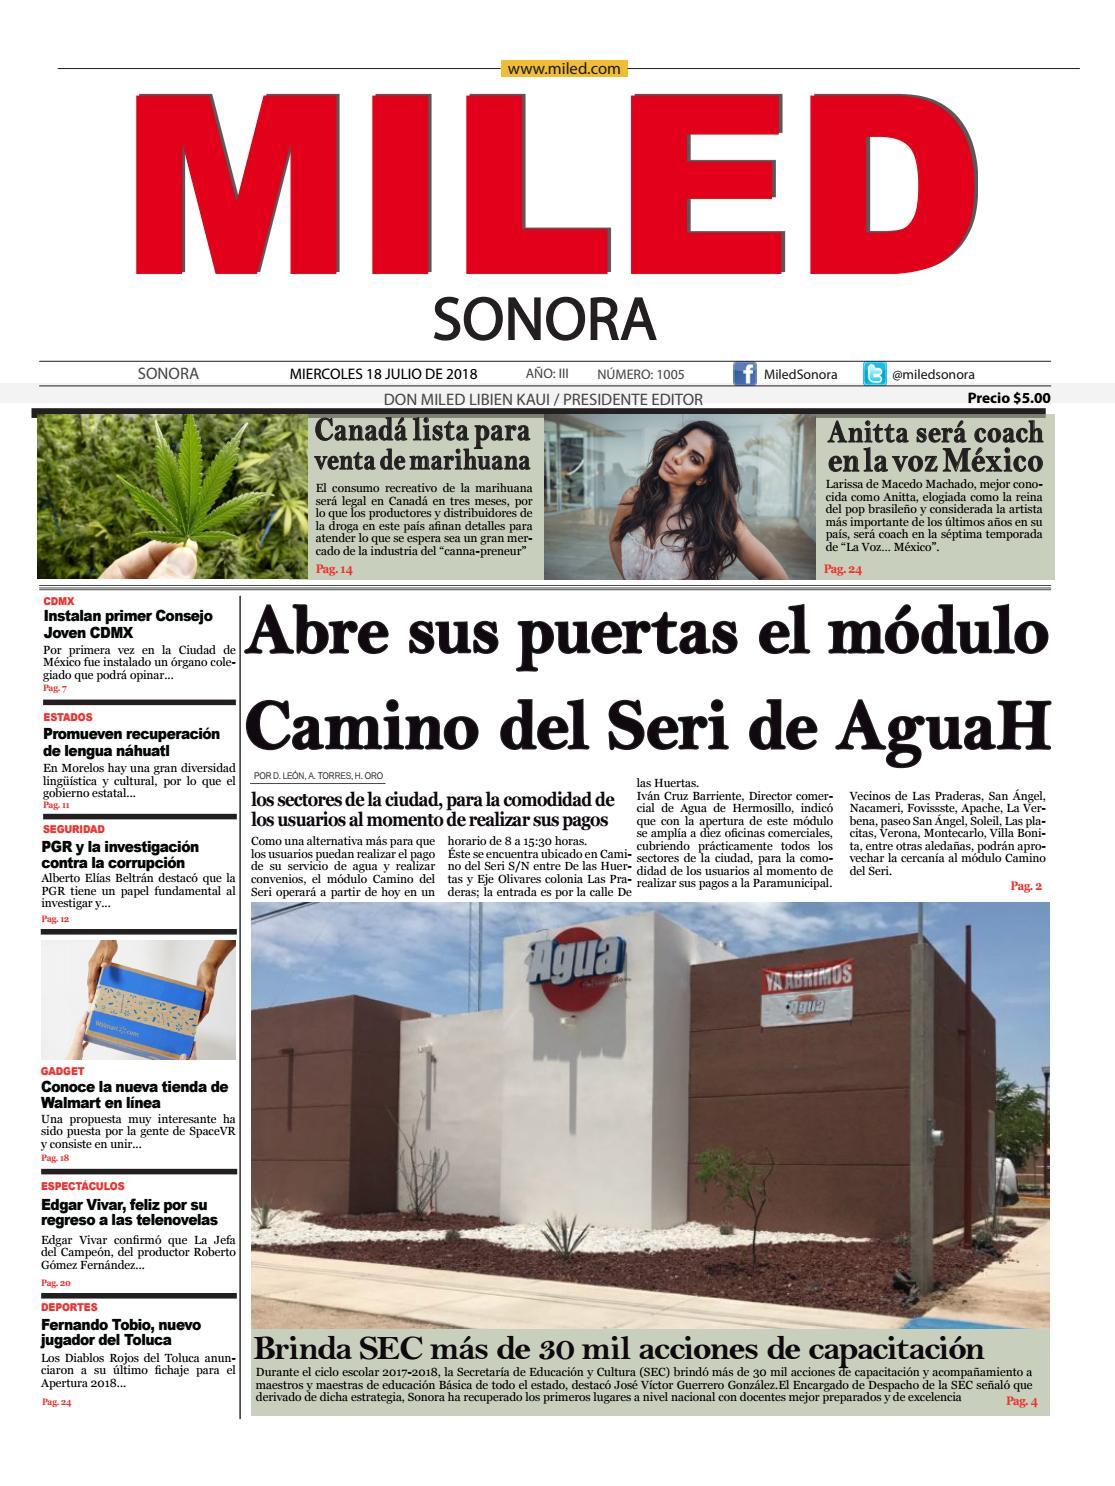 Miled Sonora 18_07_18 by Miled Estados - issuu